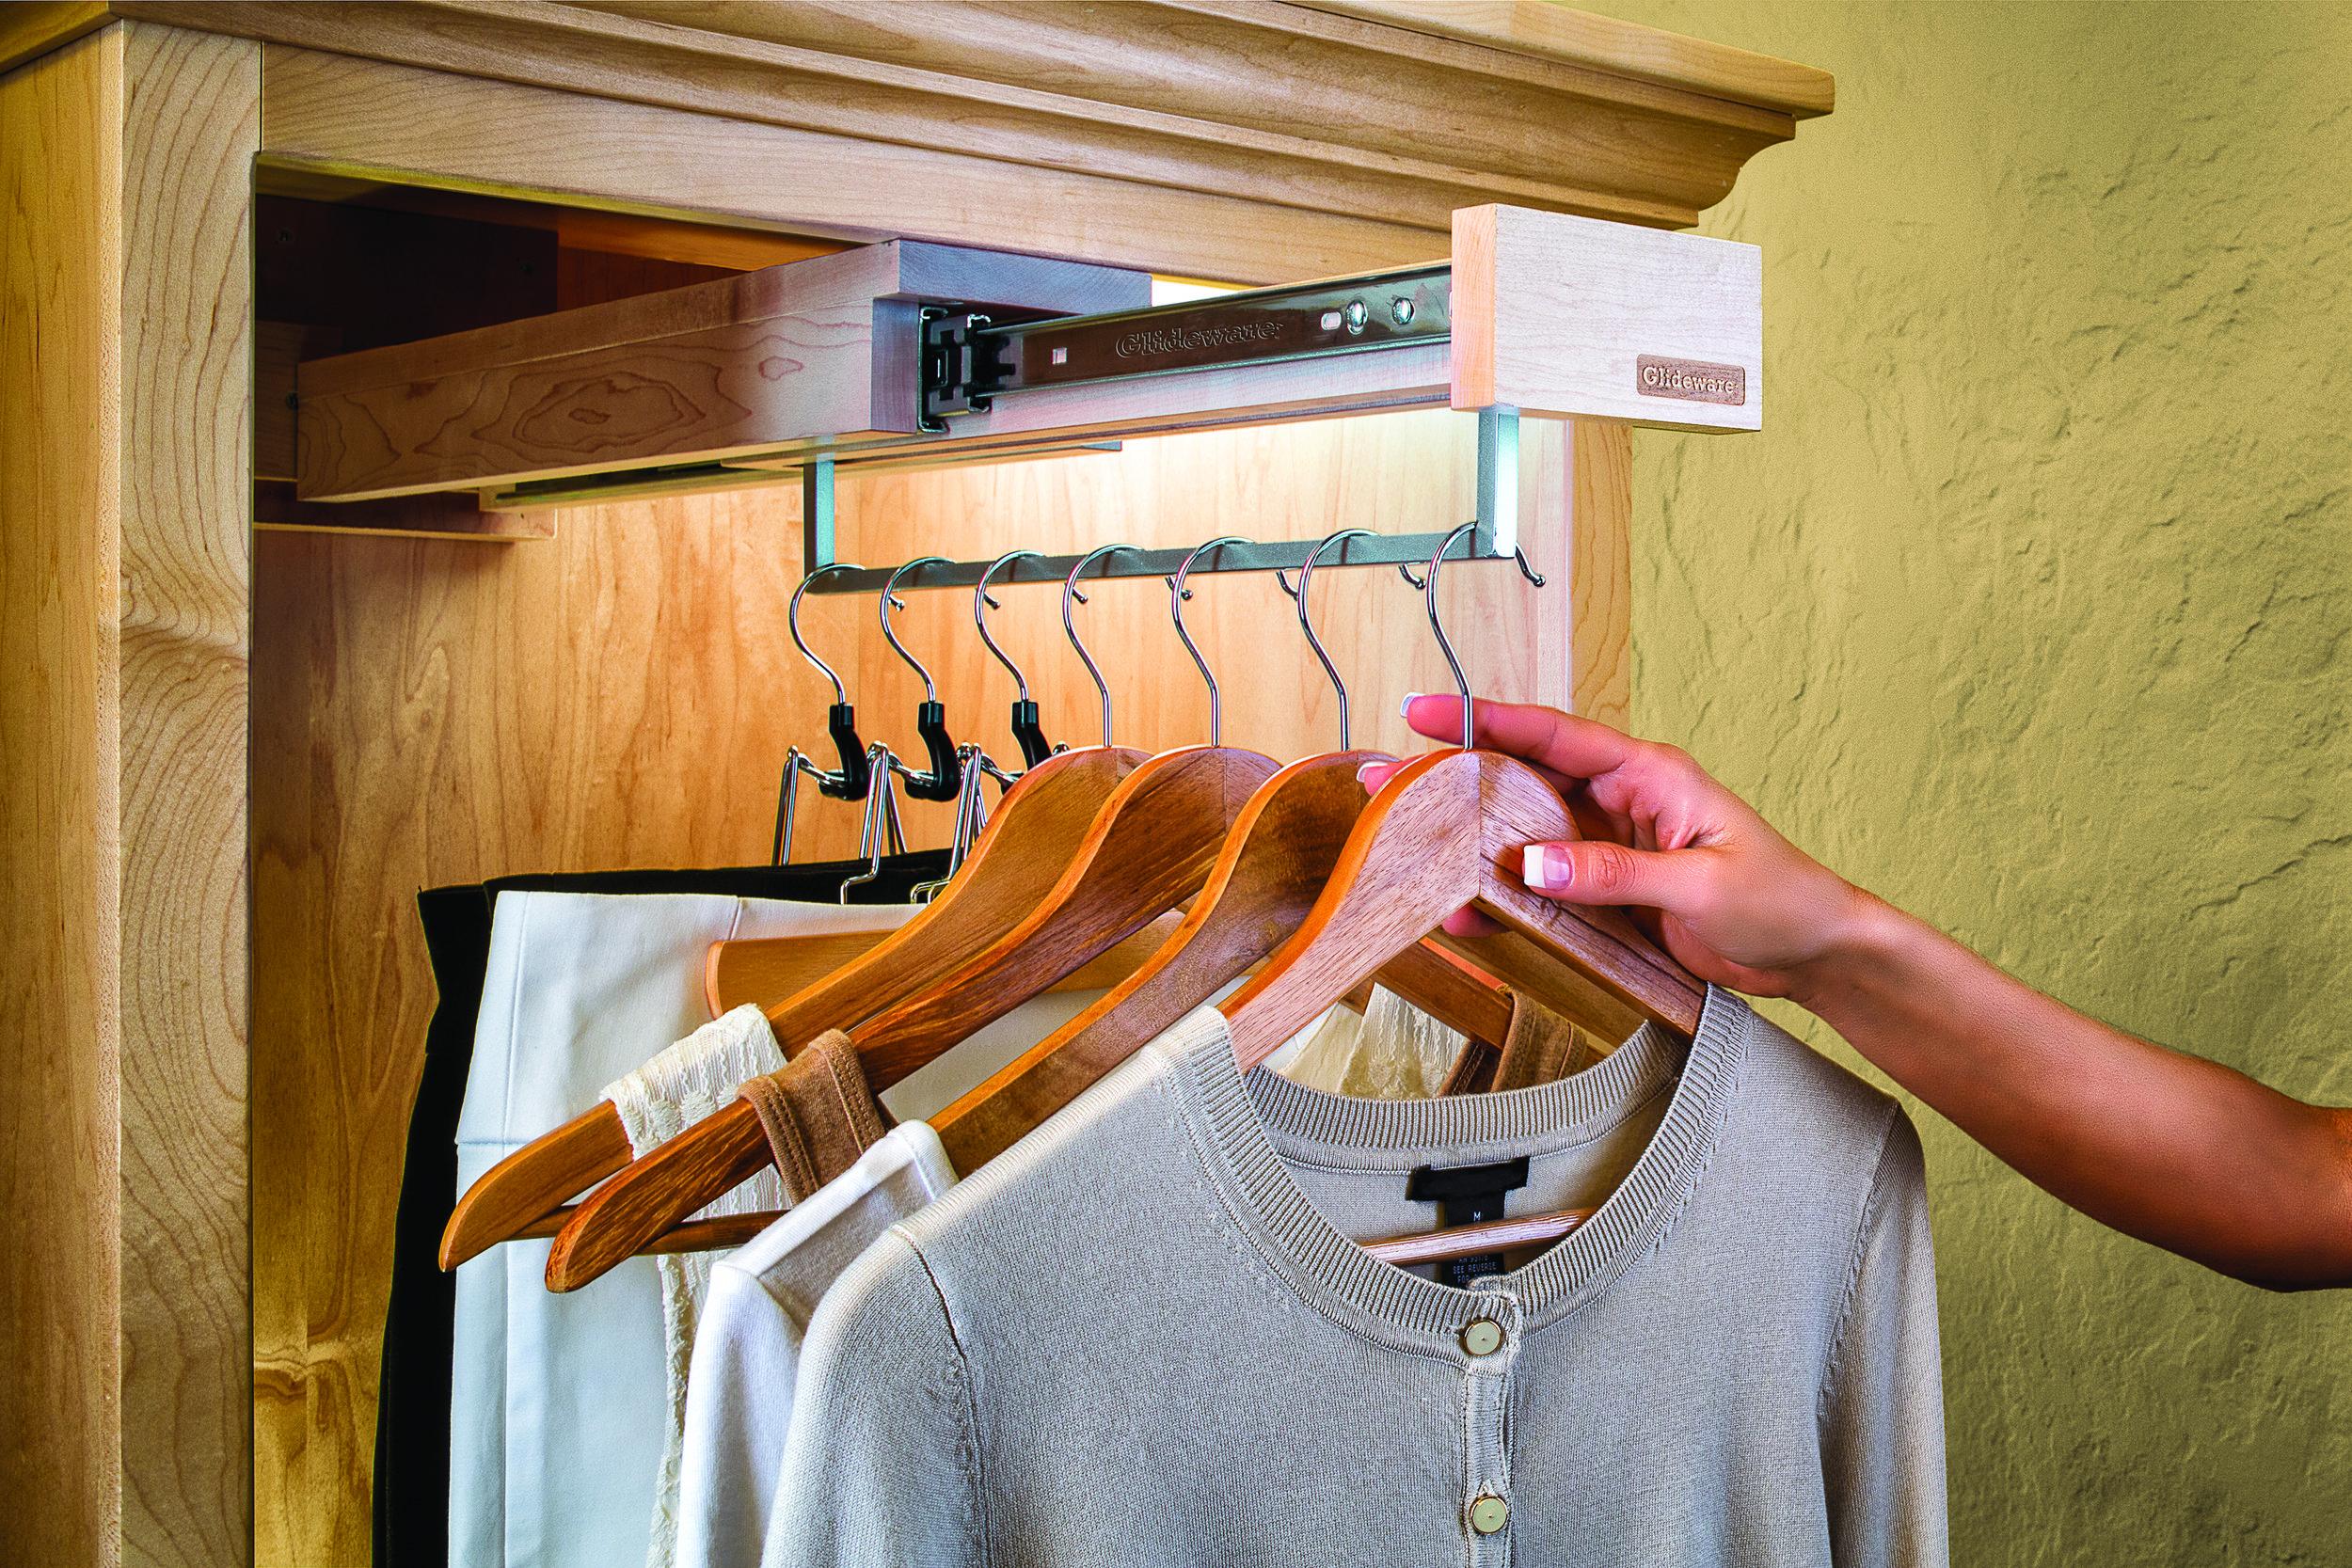 Glideware_Closet_Clothing.jpg